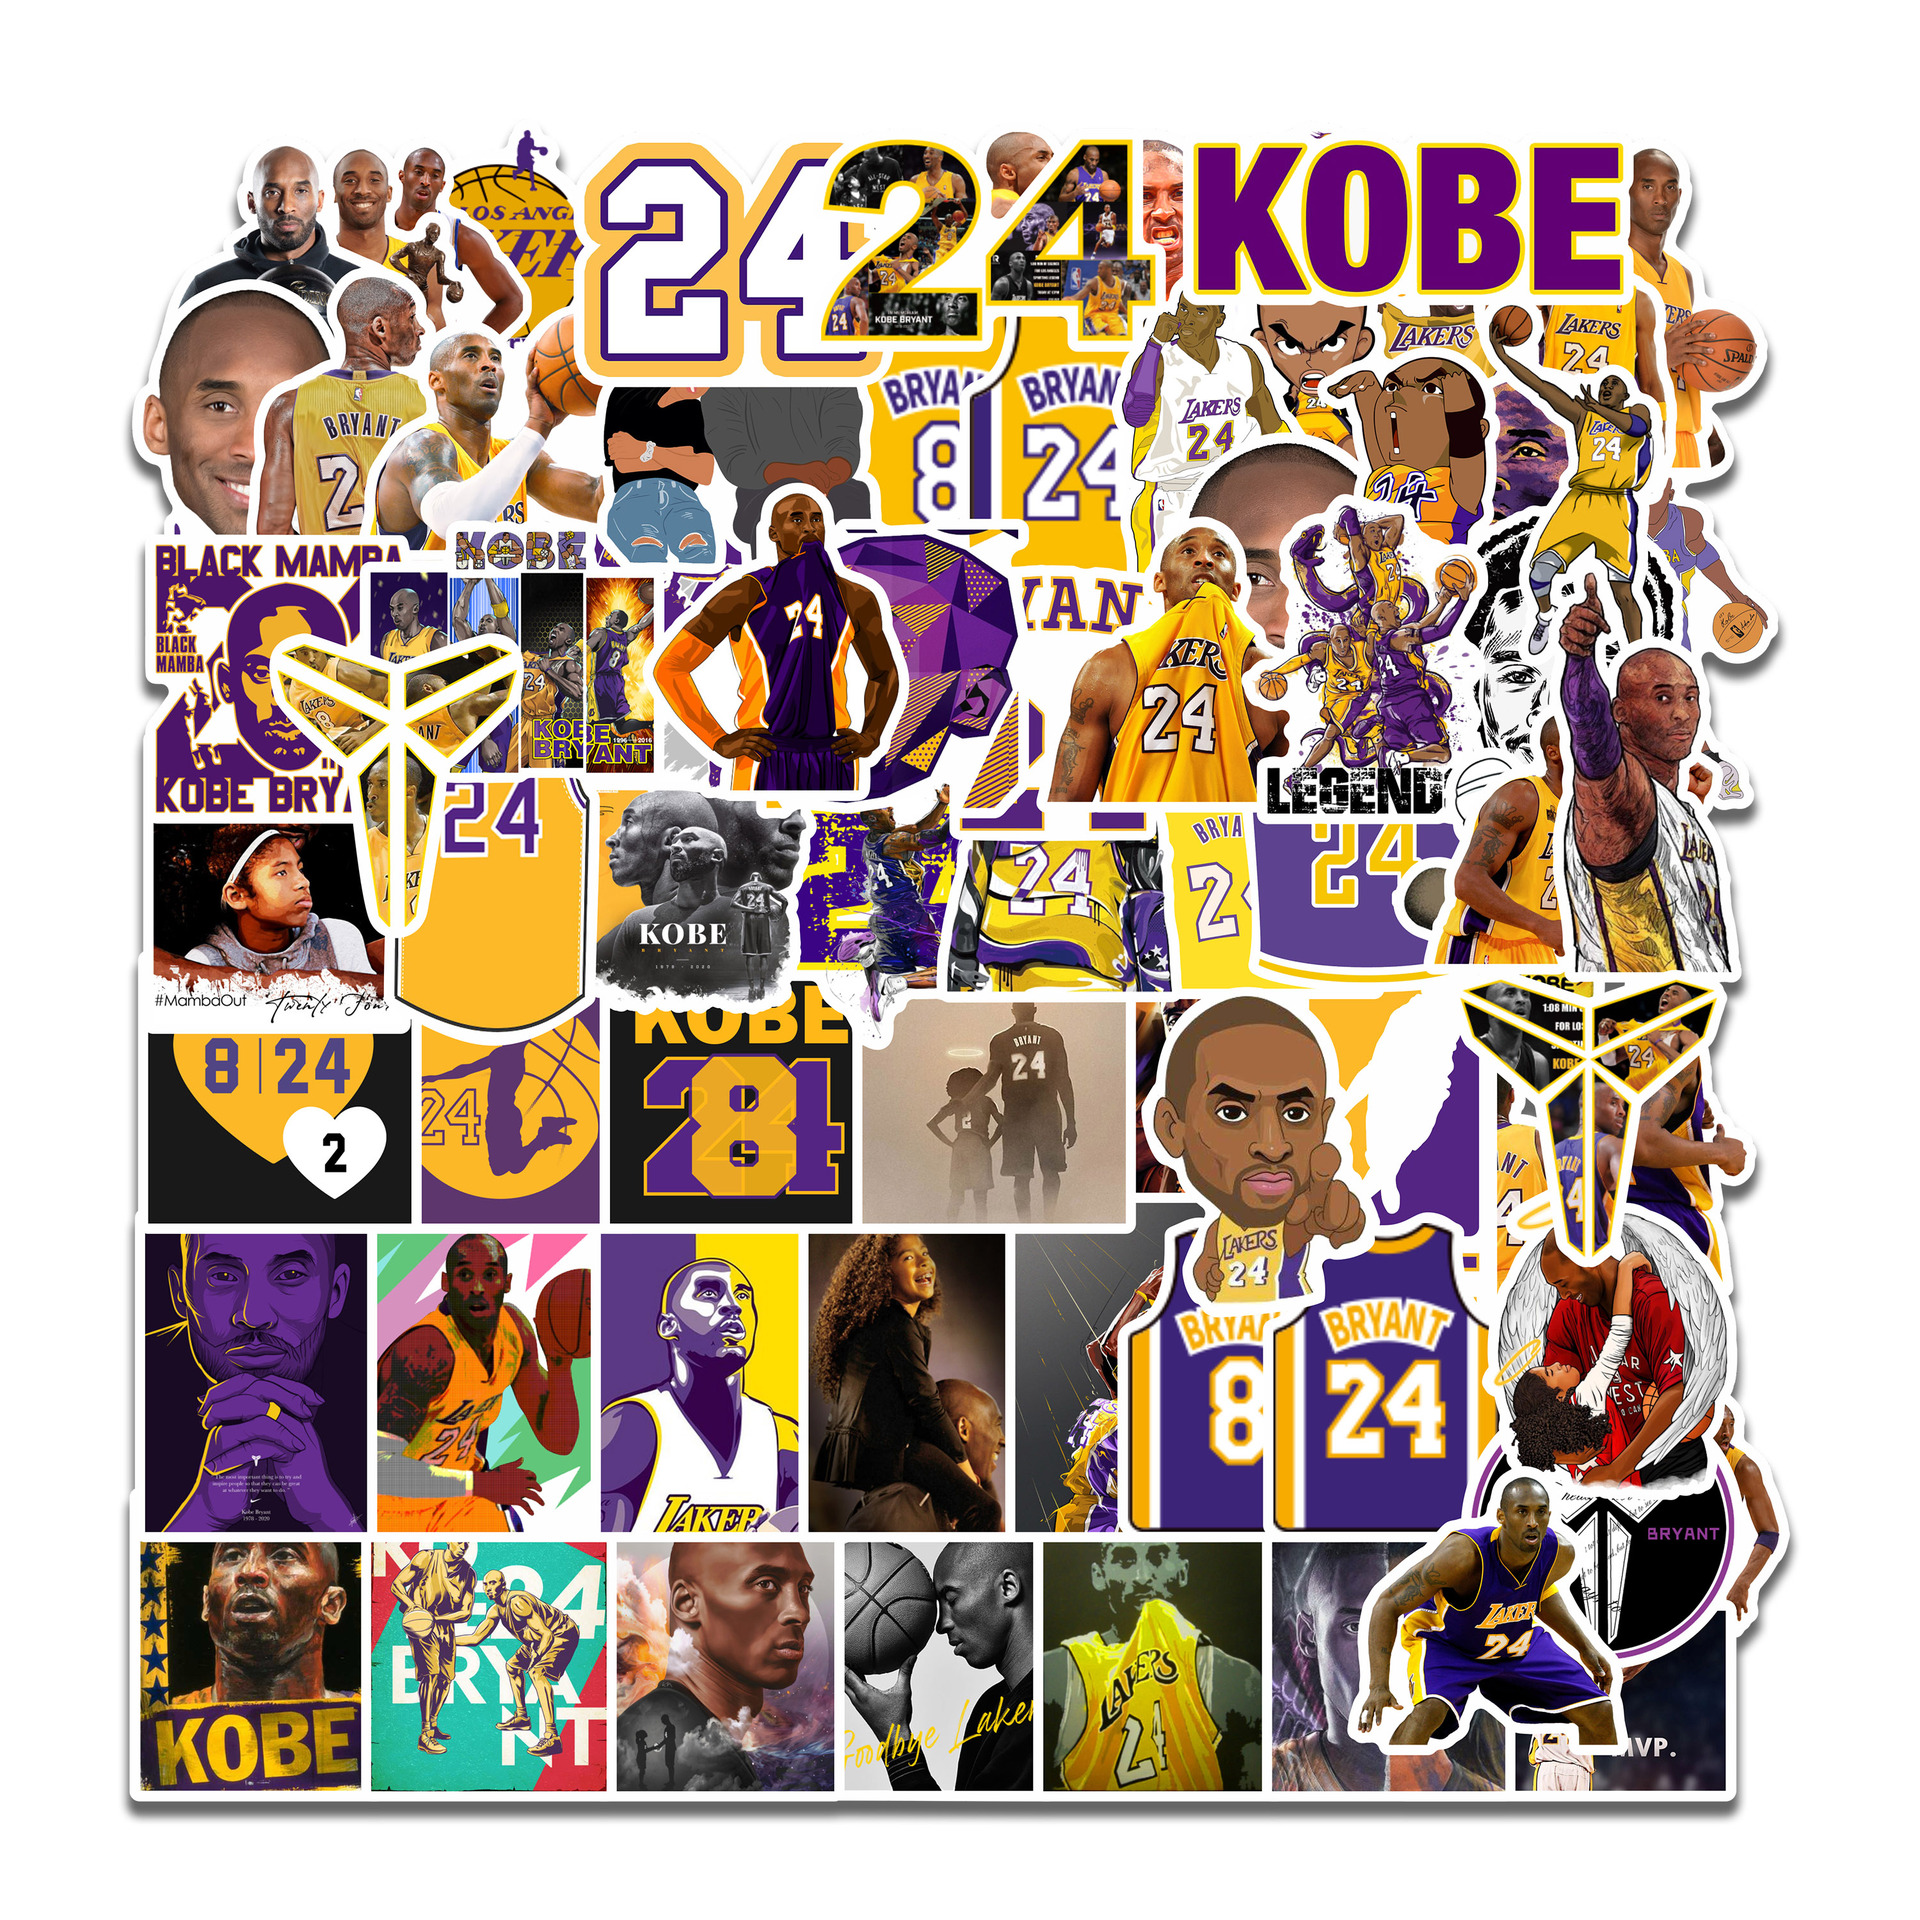 50/75 Pcs Basketball Stickers Kobe Bryant Sticker Waterproof Kids Toy Stickers For Luggage Laptop Phone Skateboard Decal